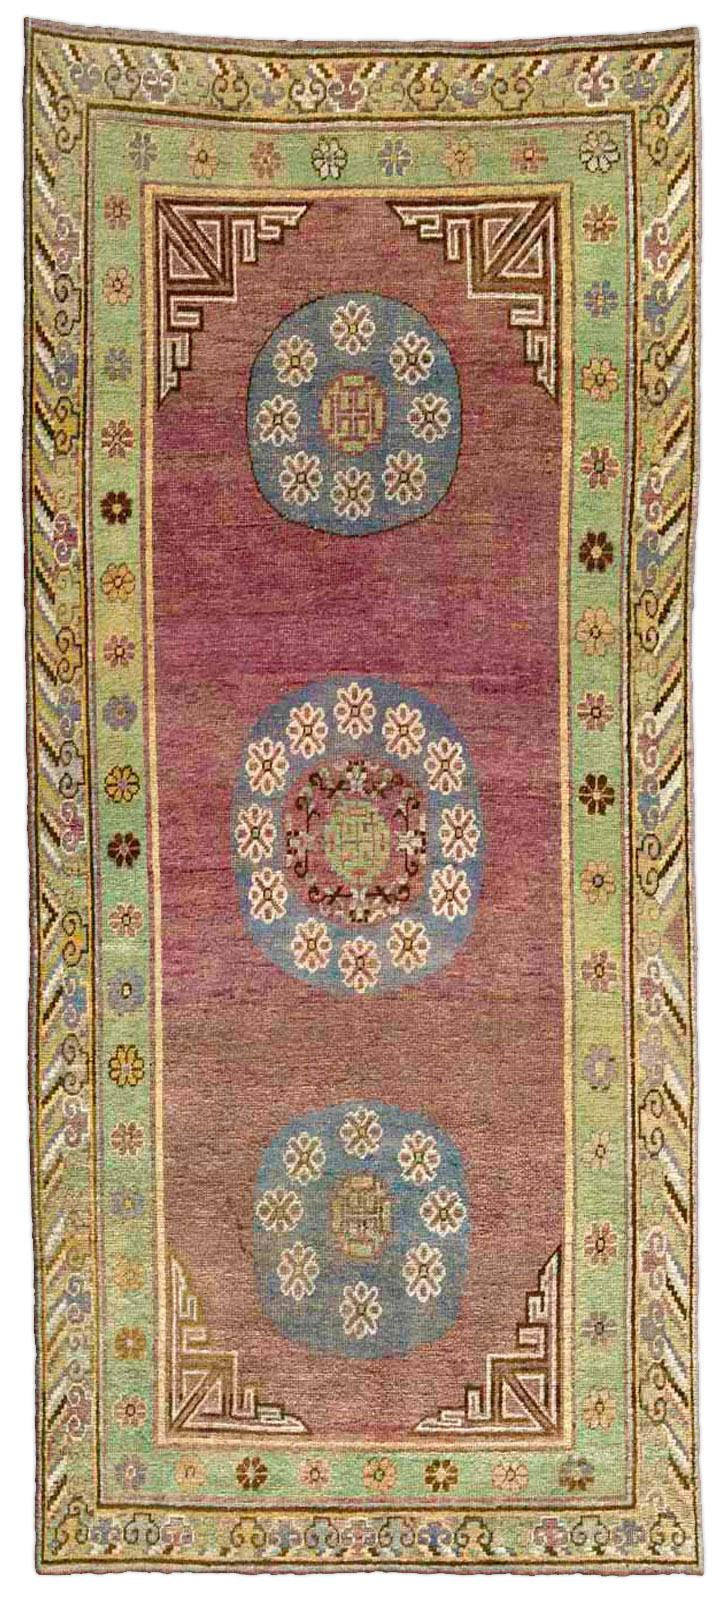 vintage-rug-chinese-samarkand-khotan-purple-geometric-botanical-bb4371-9x5